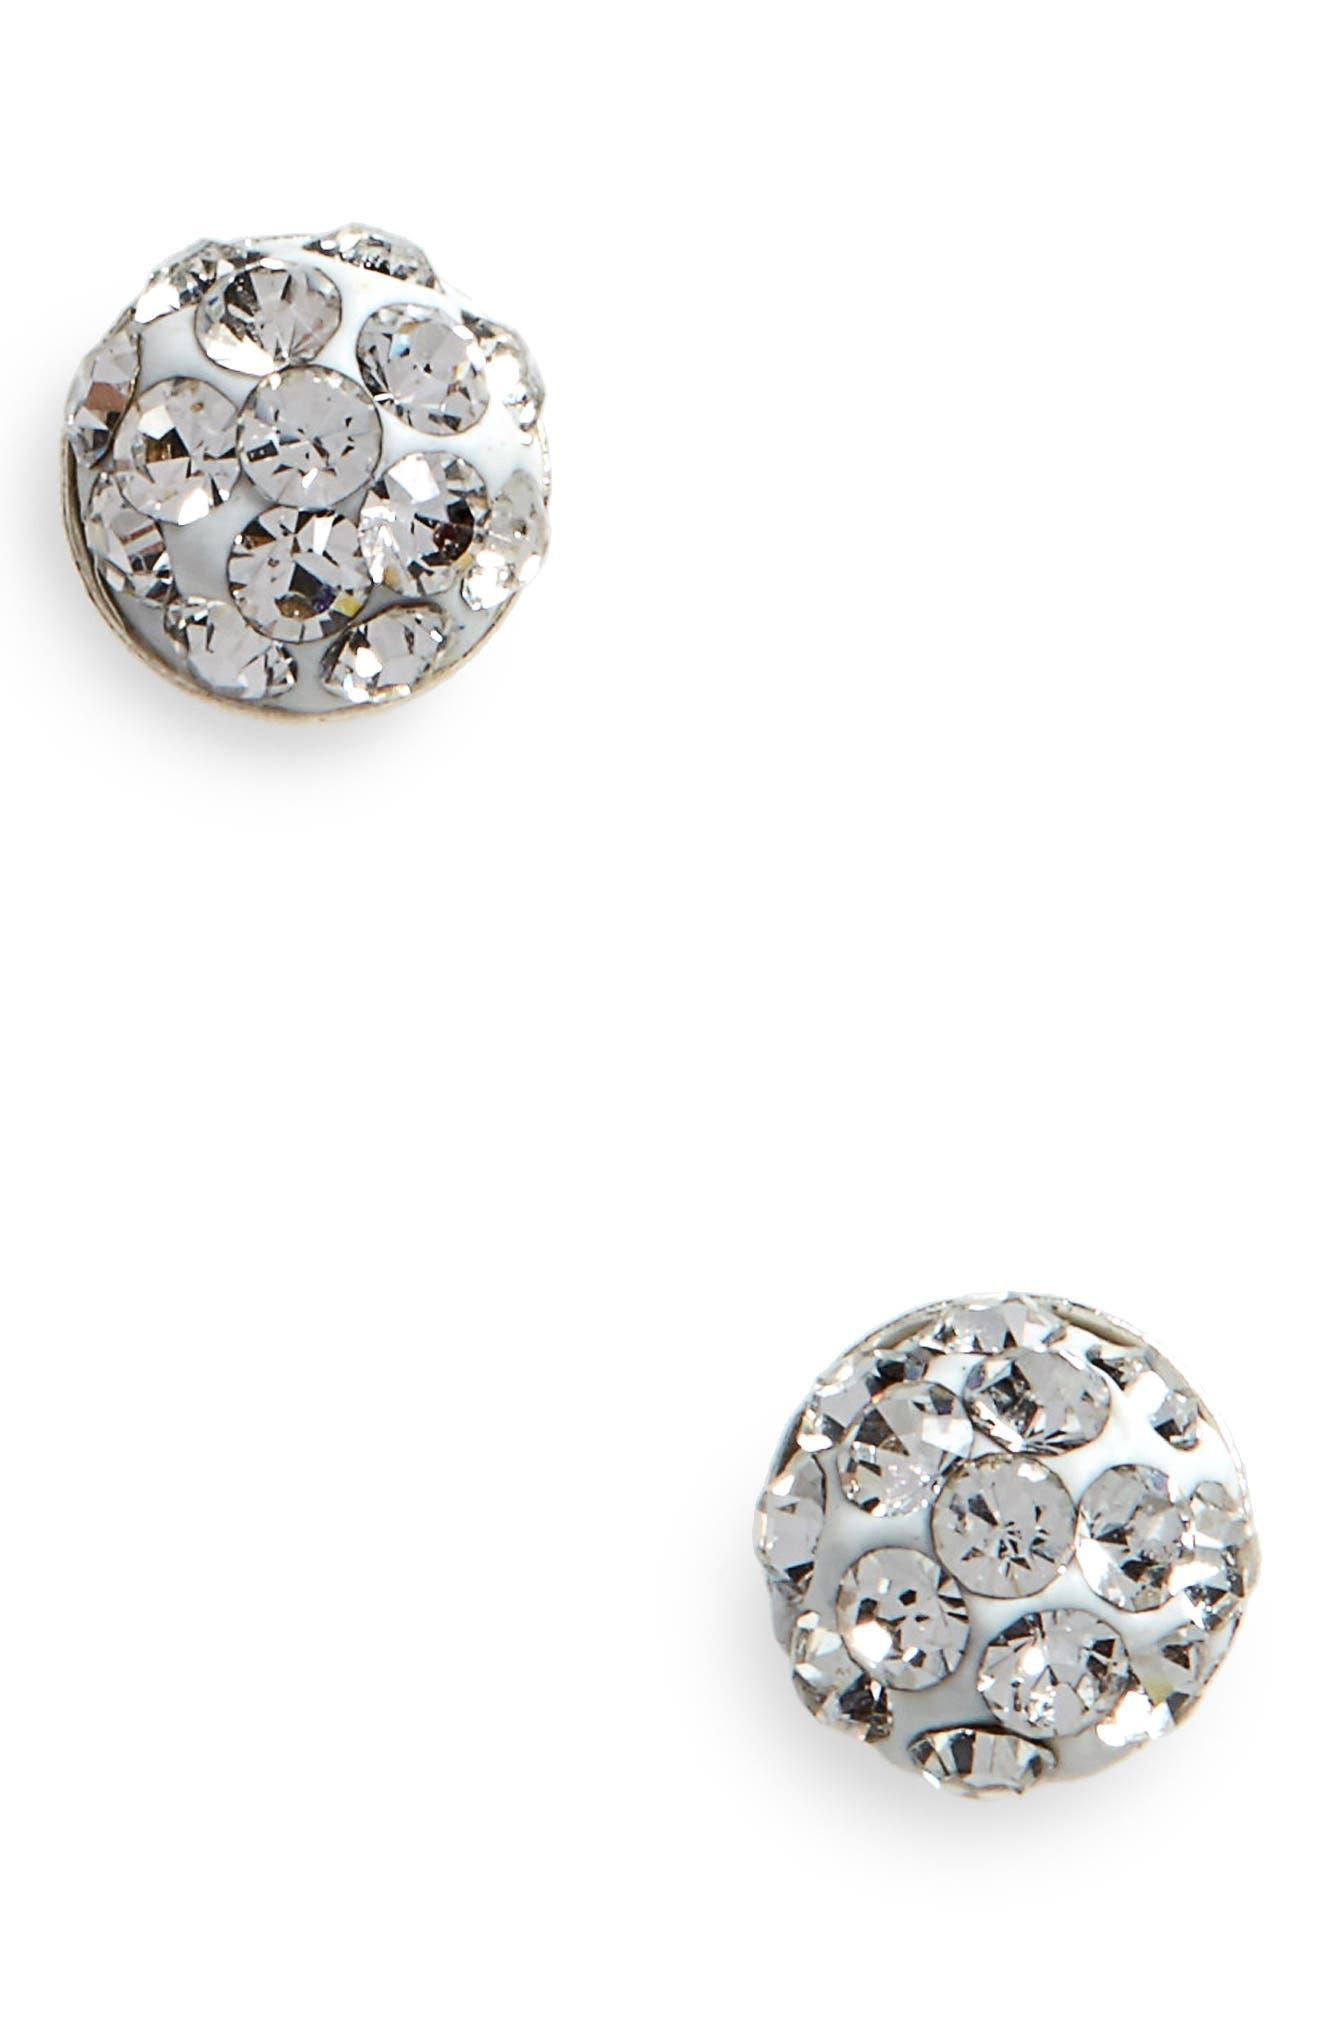 Crystal & Sterling Silver Stud Earrings,                             Main thumbnail 2, color,